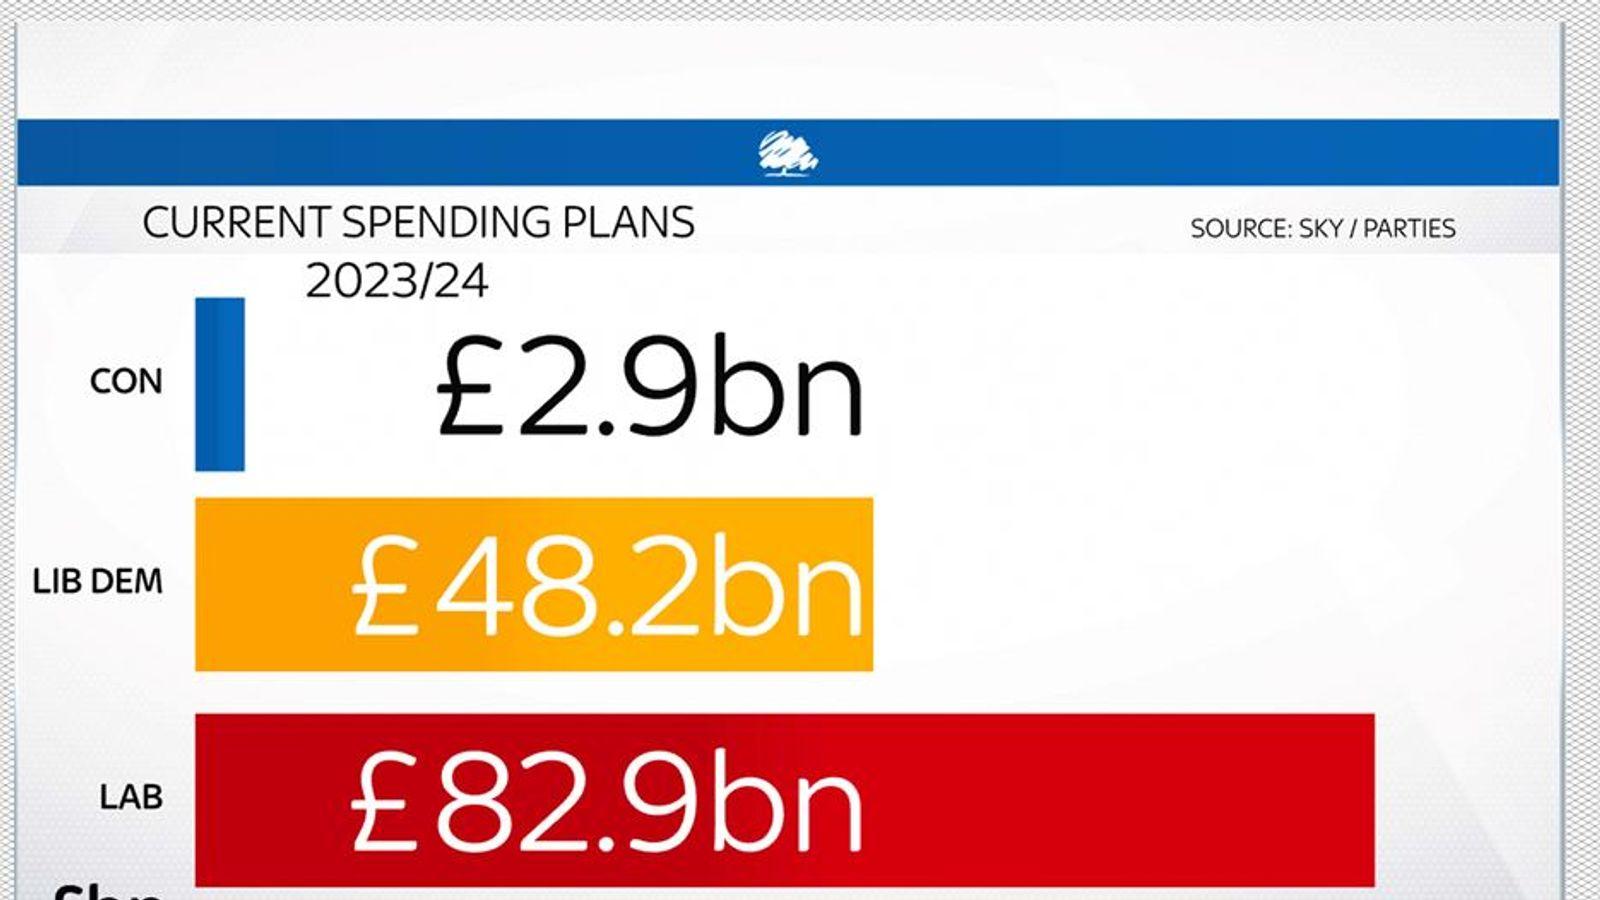 skynews-campaign-check-spending-plans_48